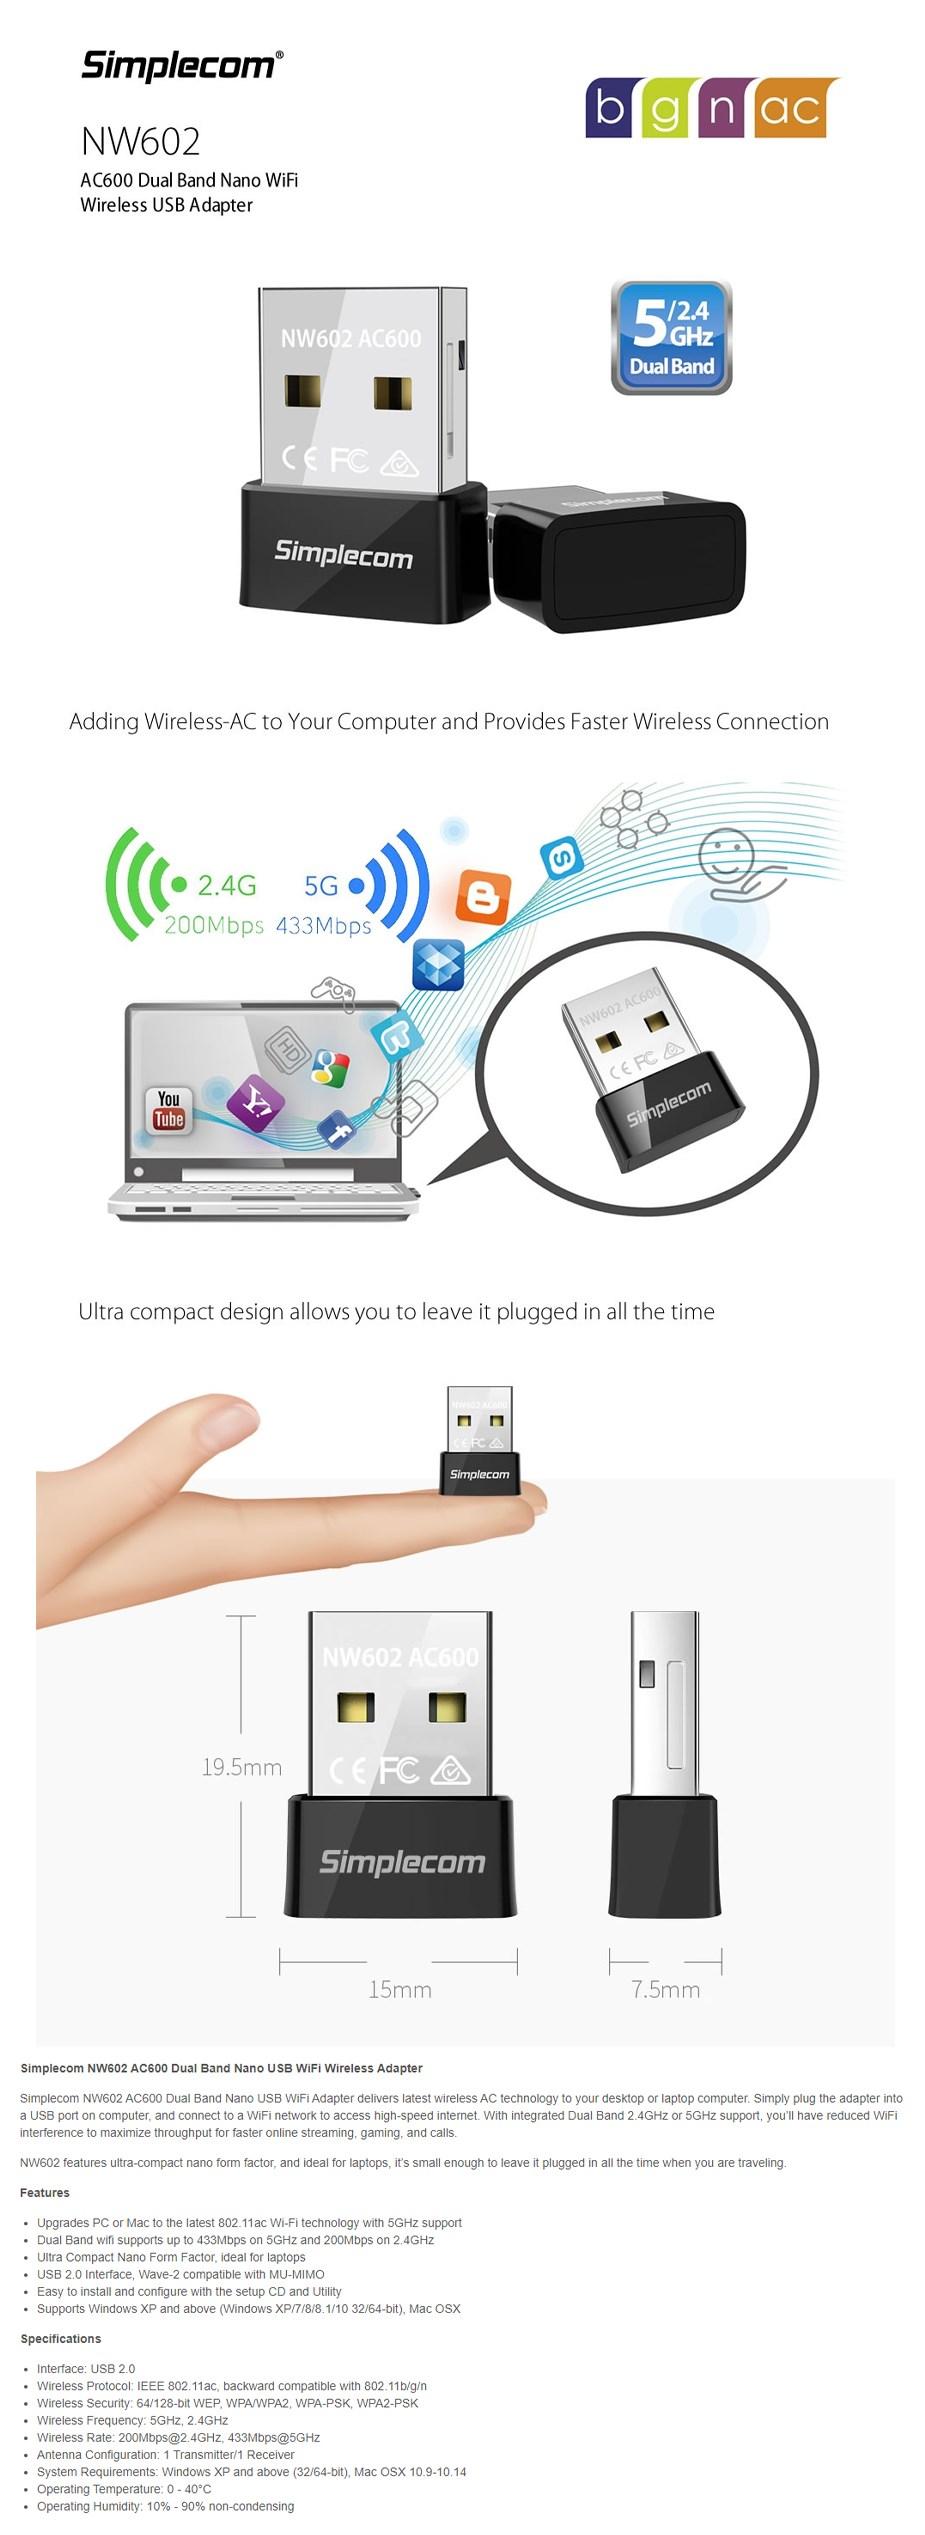 Simplecom NW602 AC600 Dual-Band Nano USB WiFi Adapter  - Overview 1